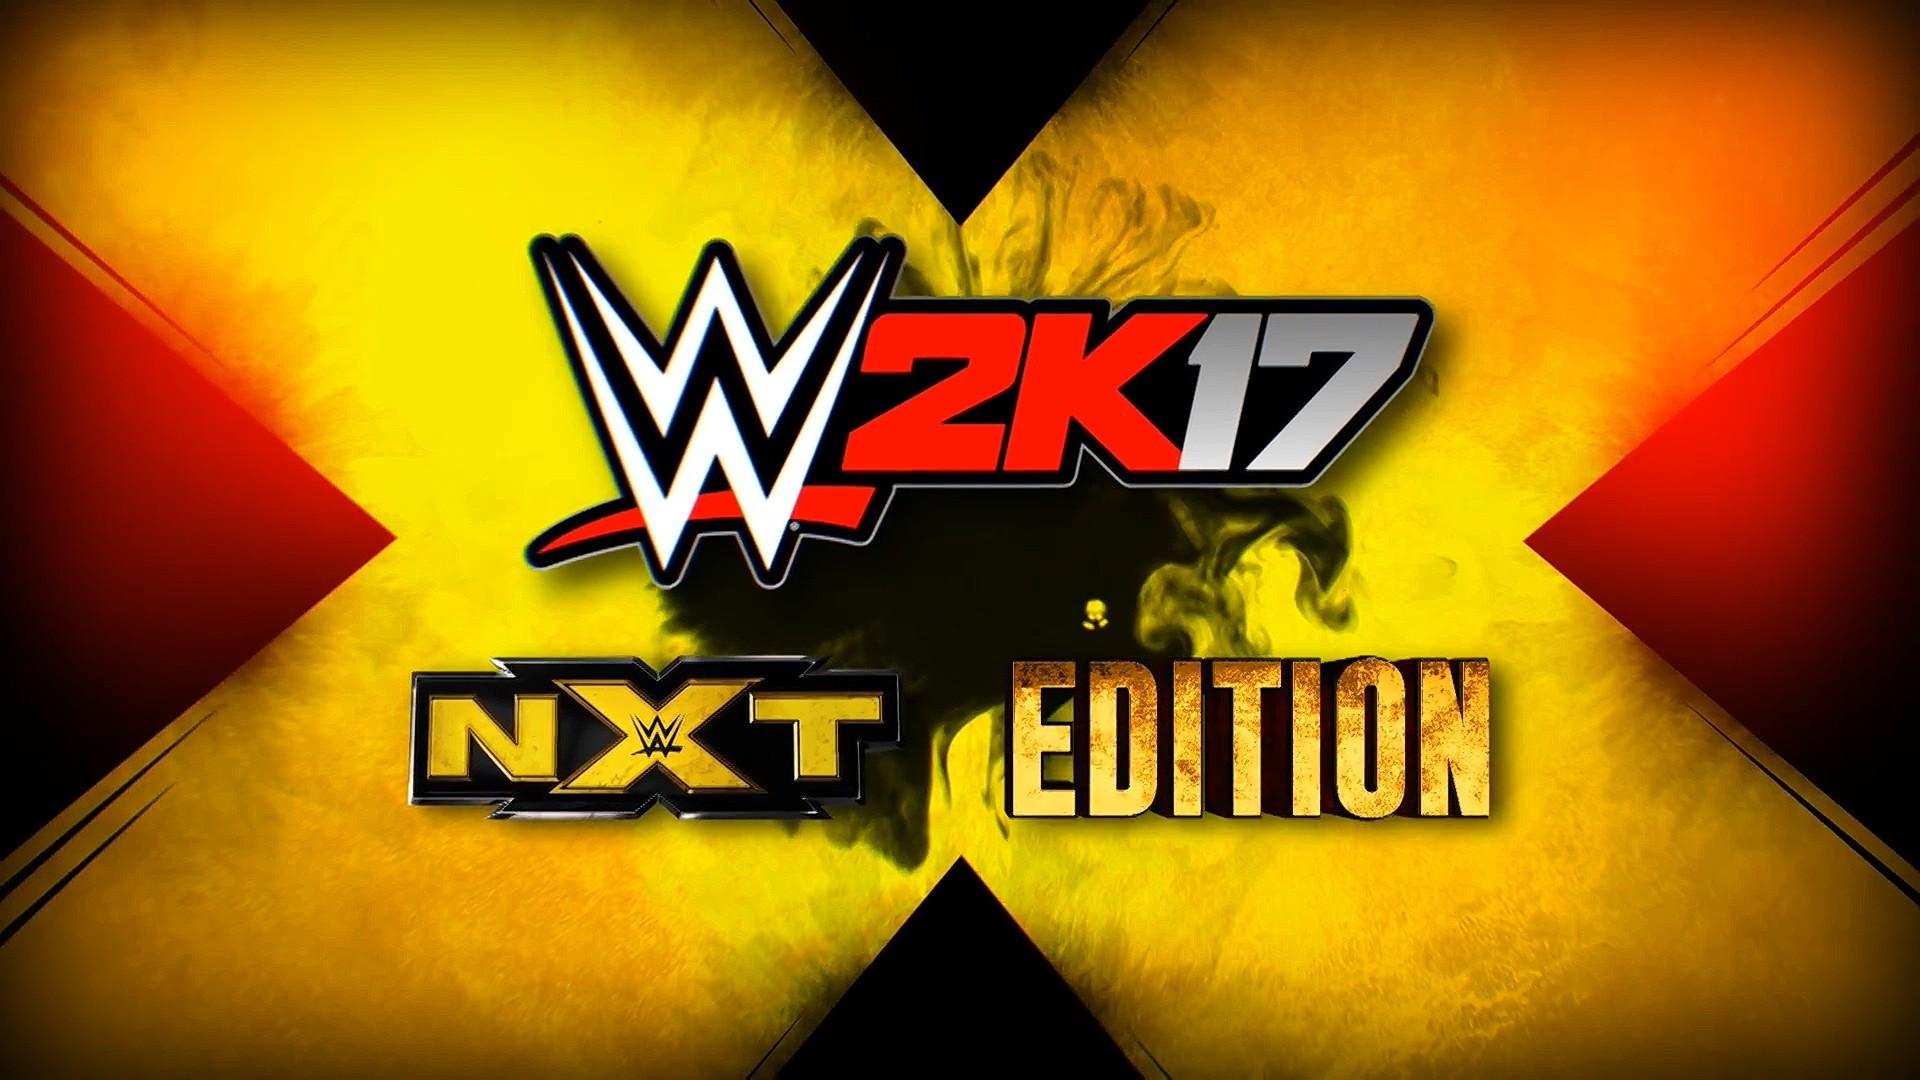 《WWE 2K17》限定版详情公布